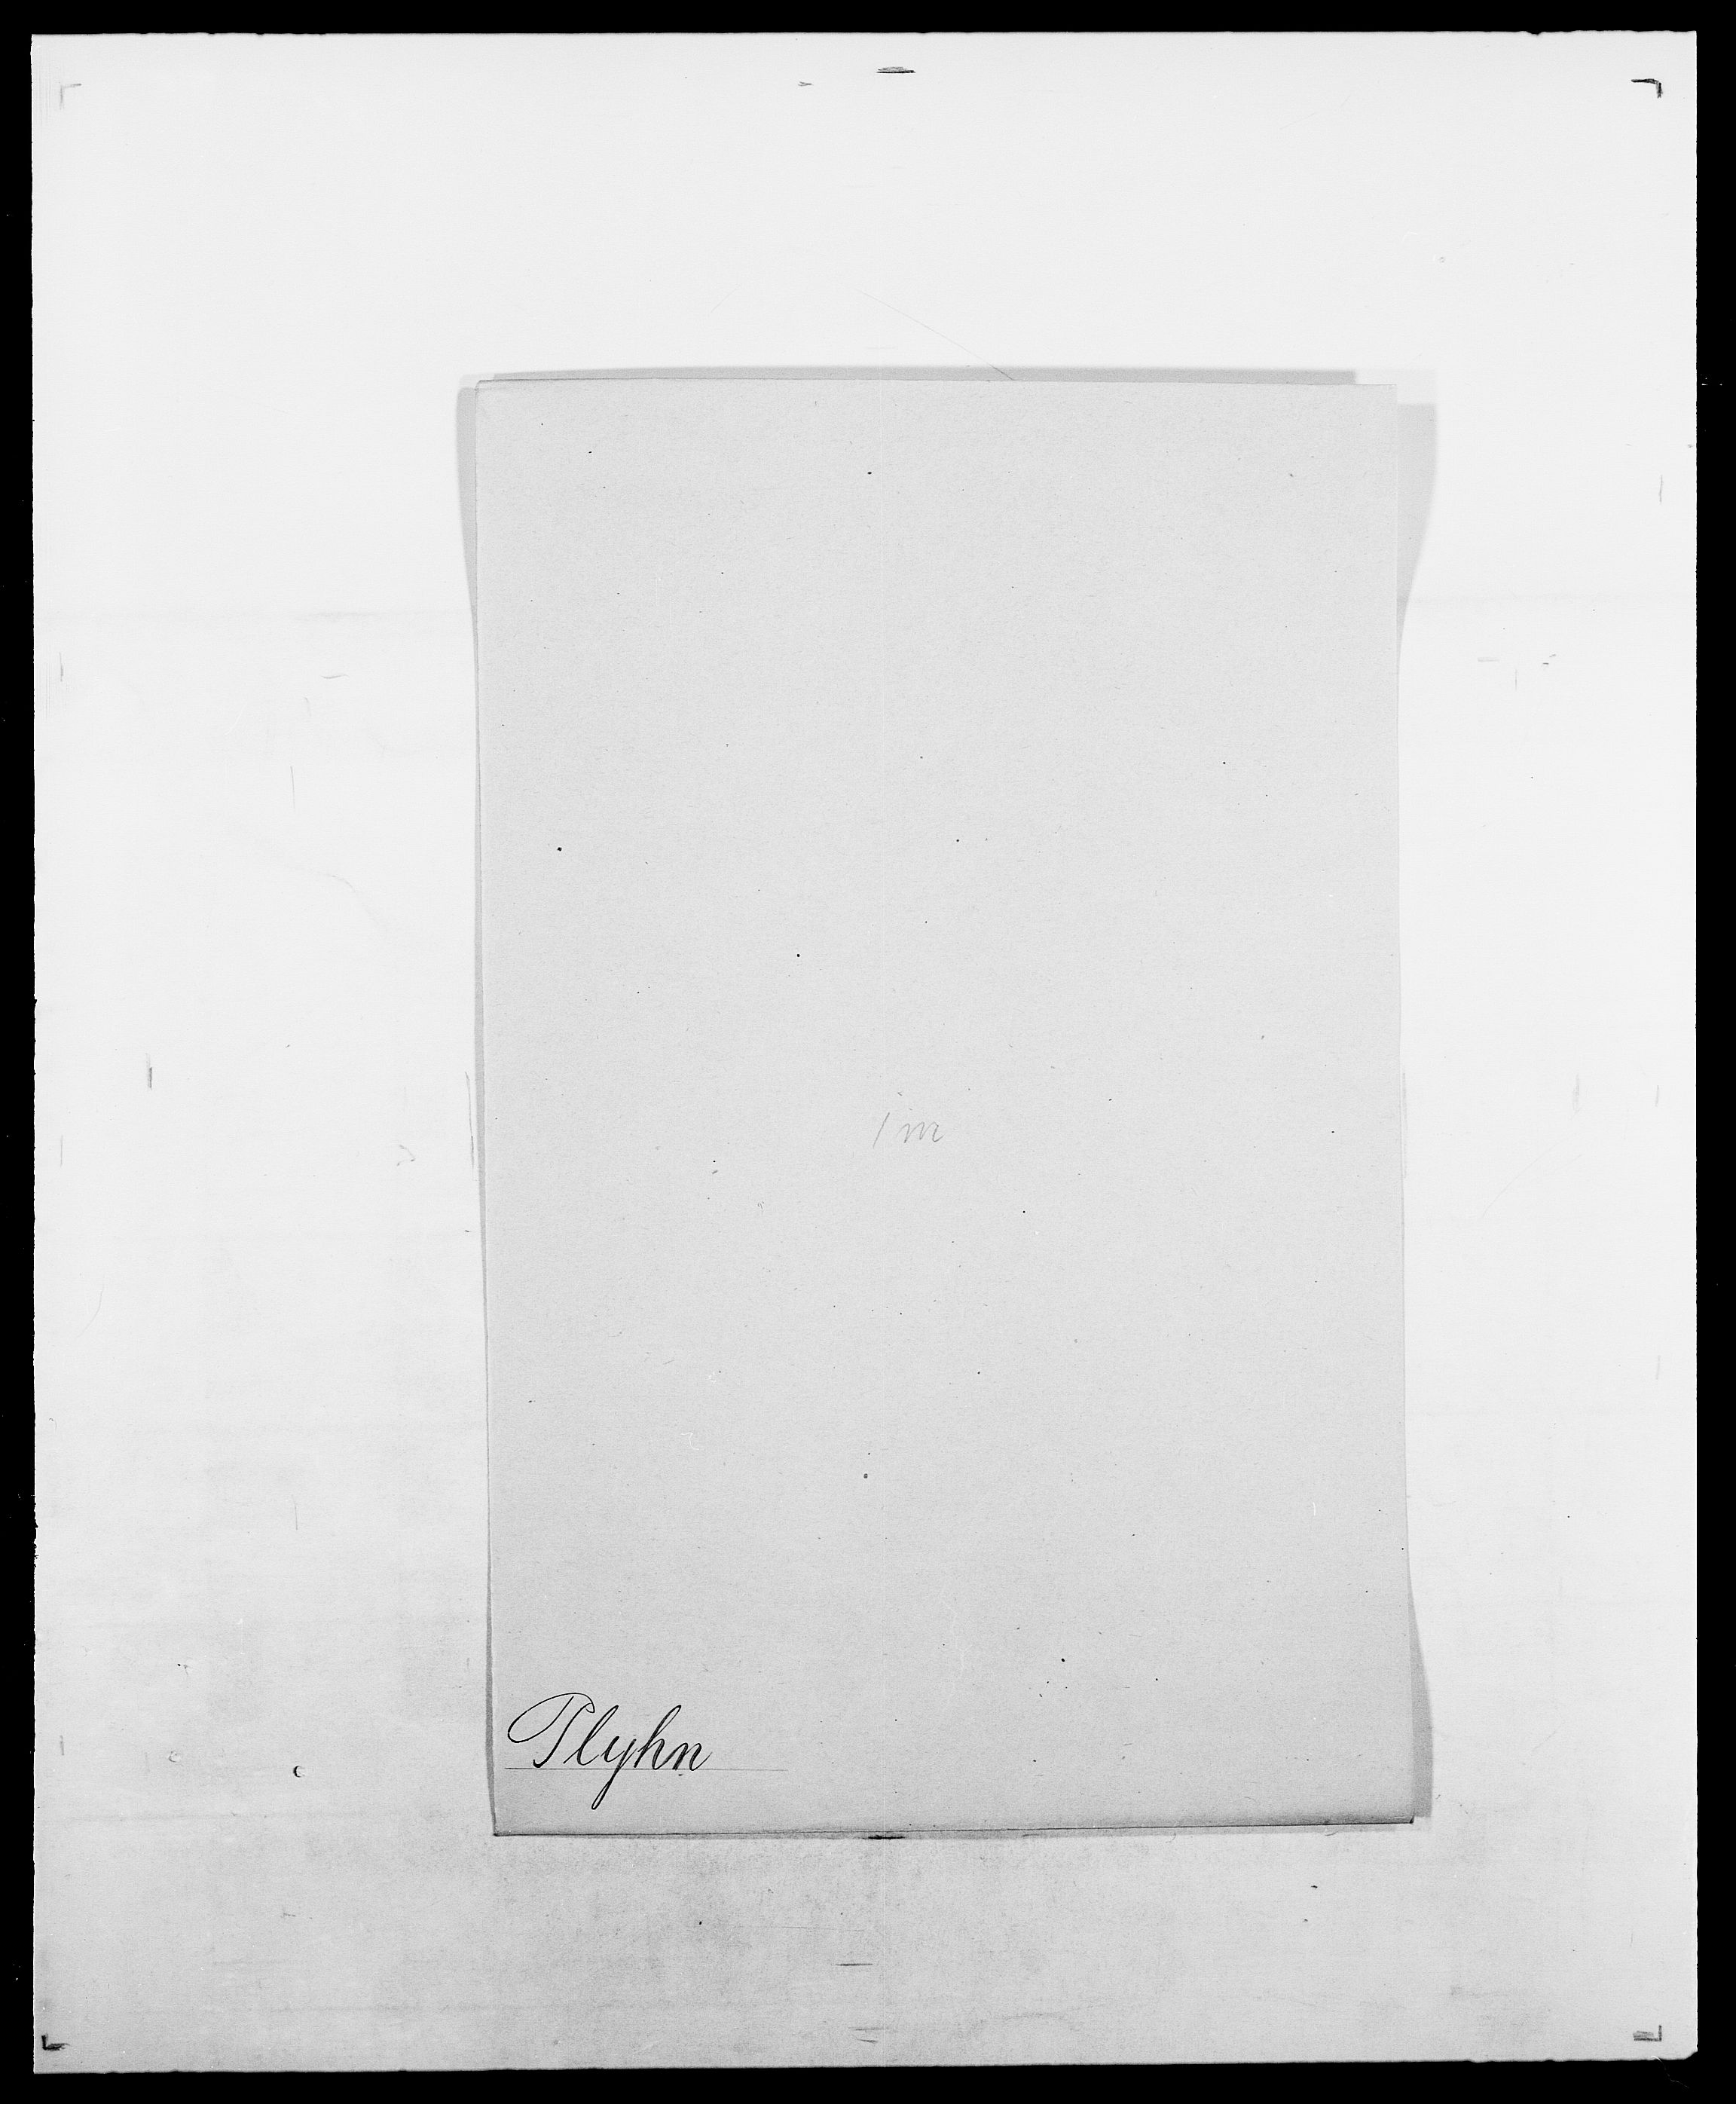 SAO, Delgobe, Charles Antoine - samling, D/Da/L0031: de Place - Raaum, s. 148